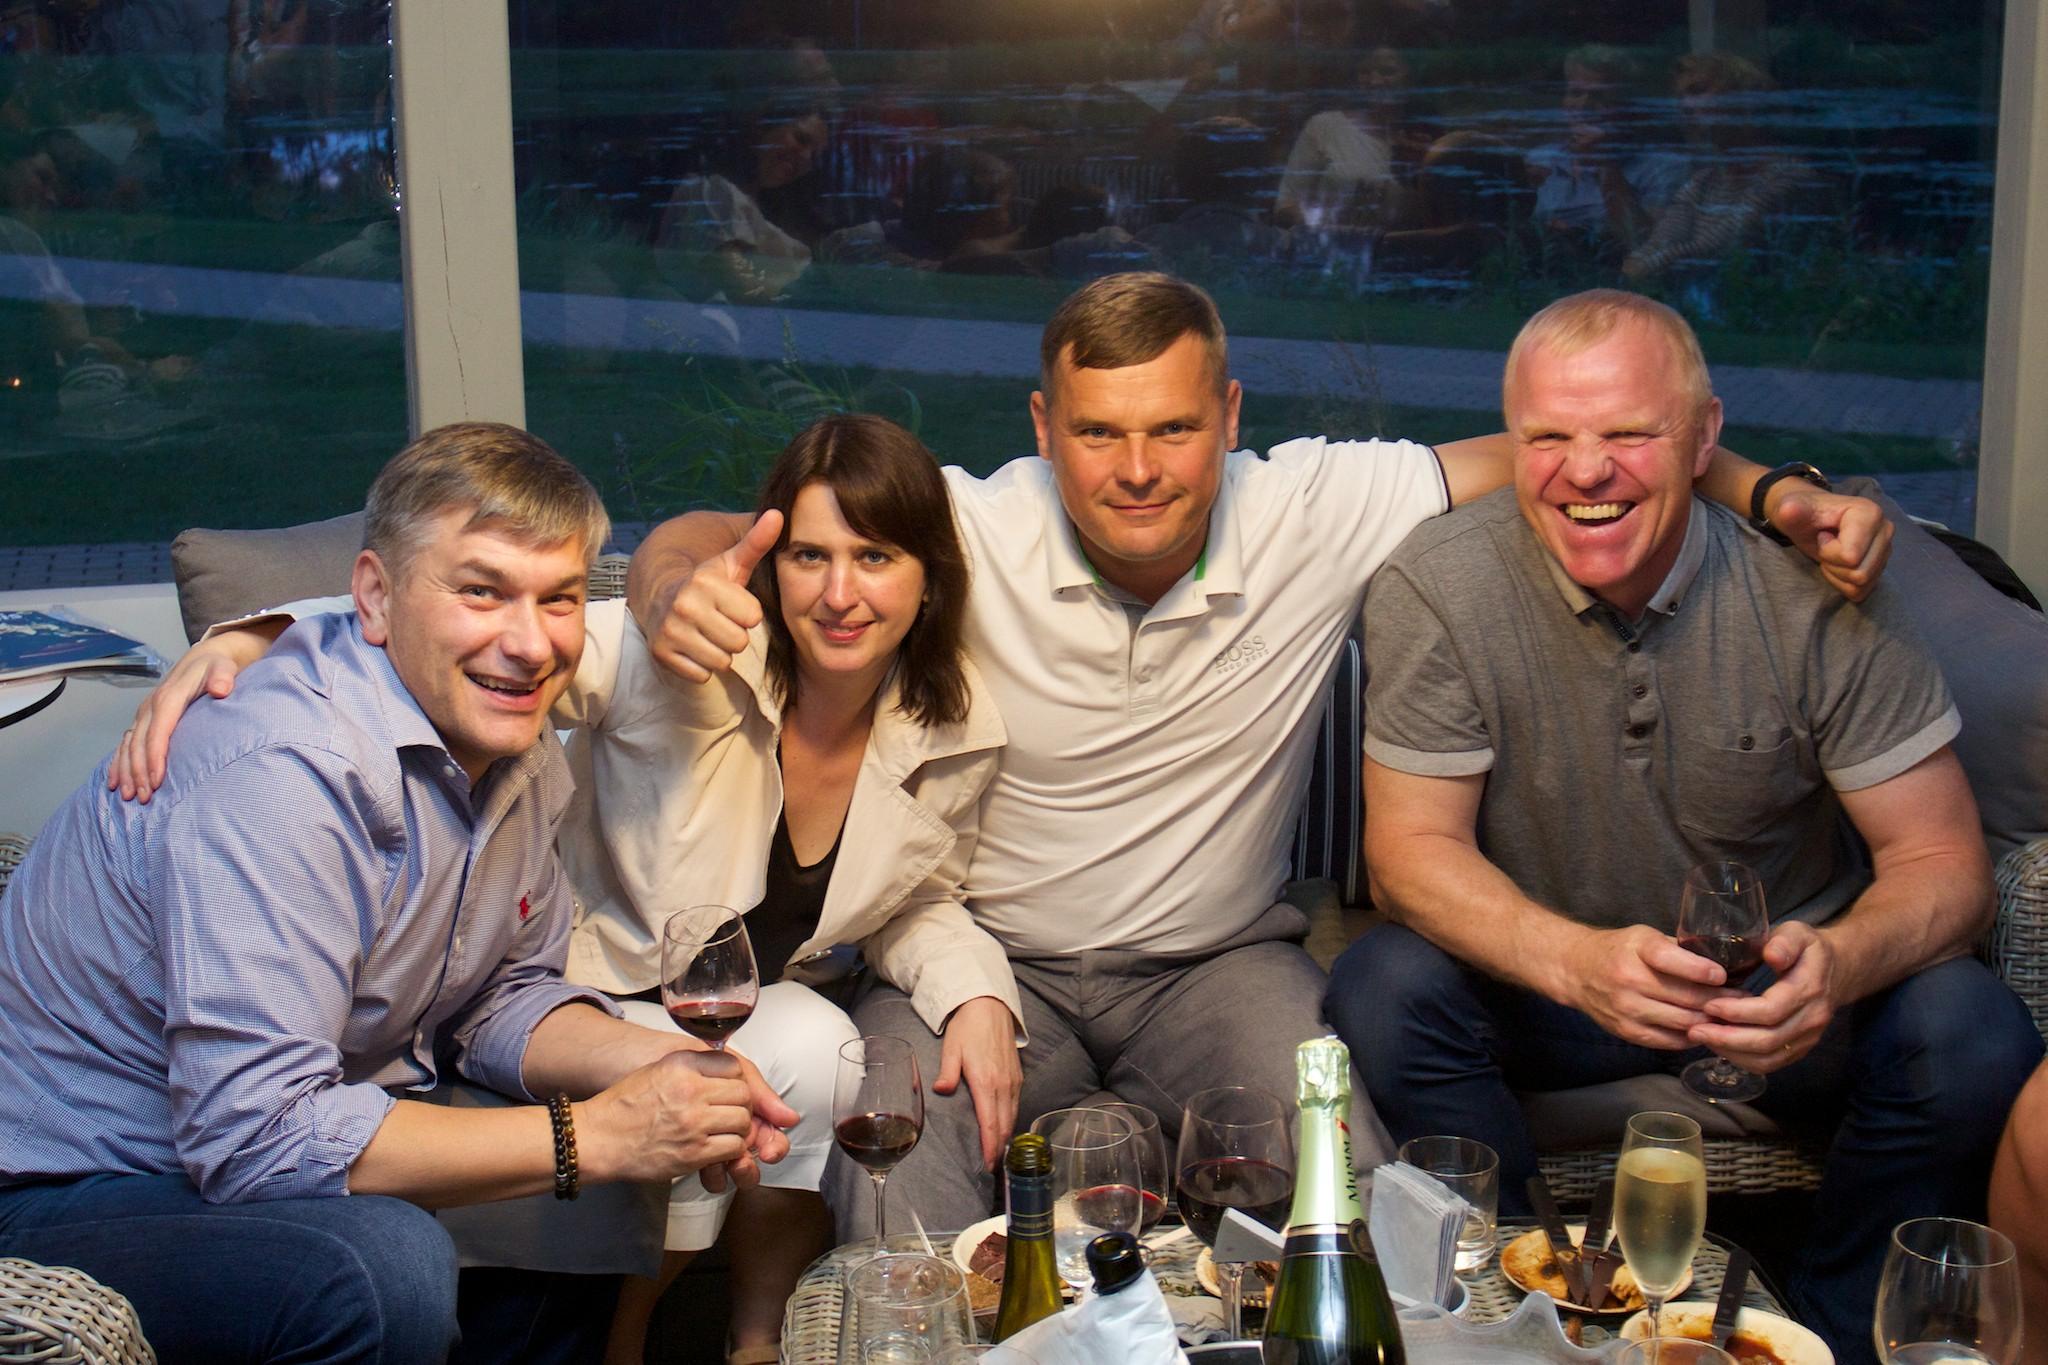 Gero skonio klubas Druskininkuose (foto D. Gumbrevičius)